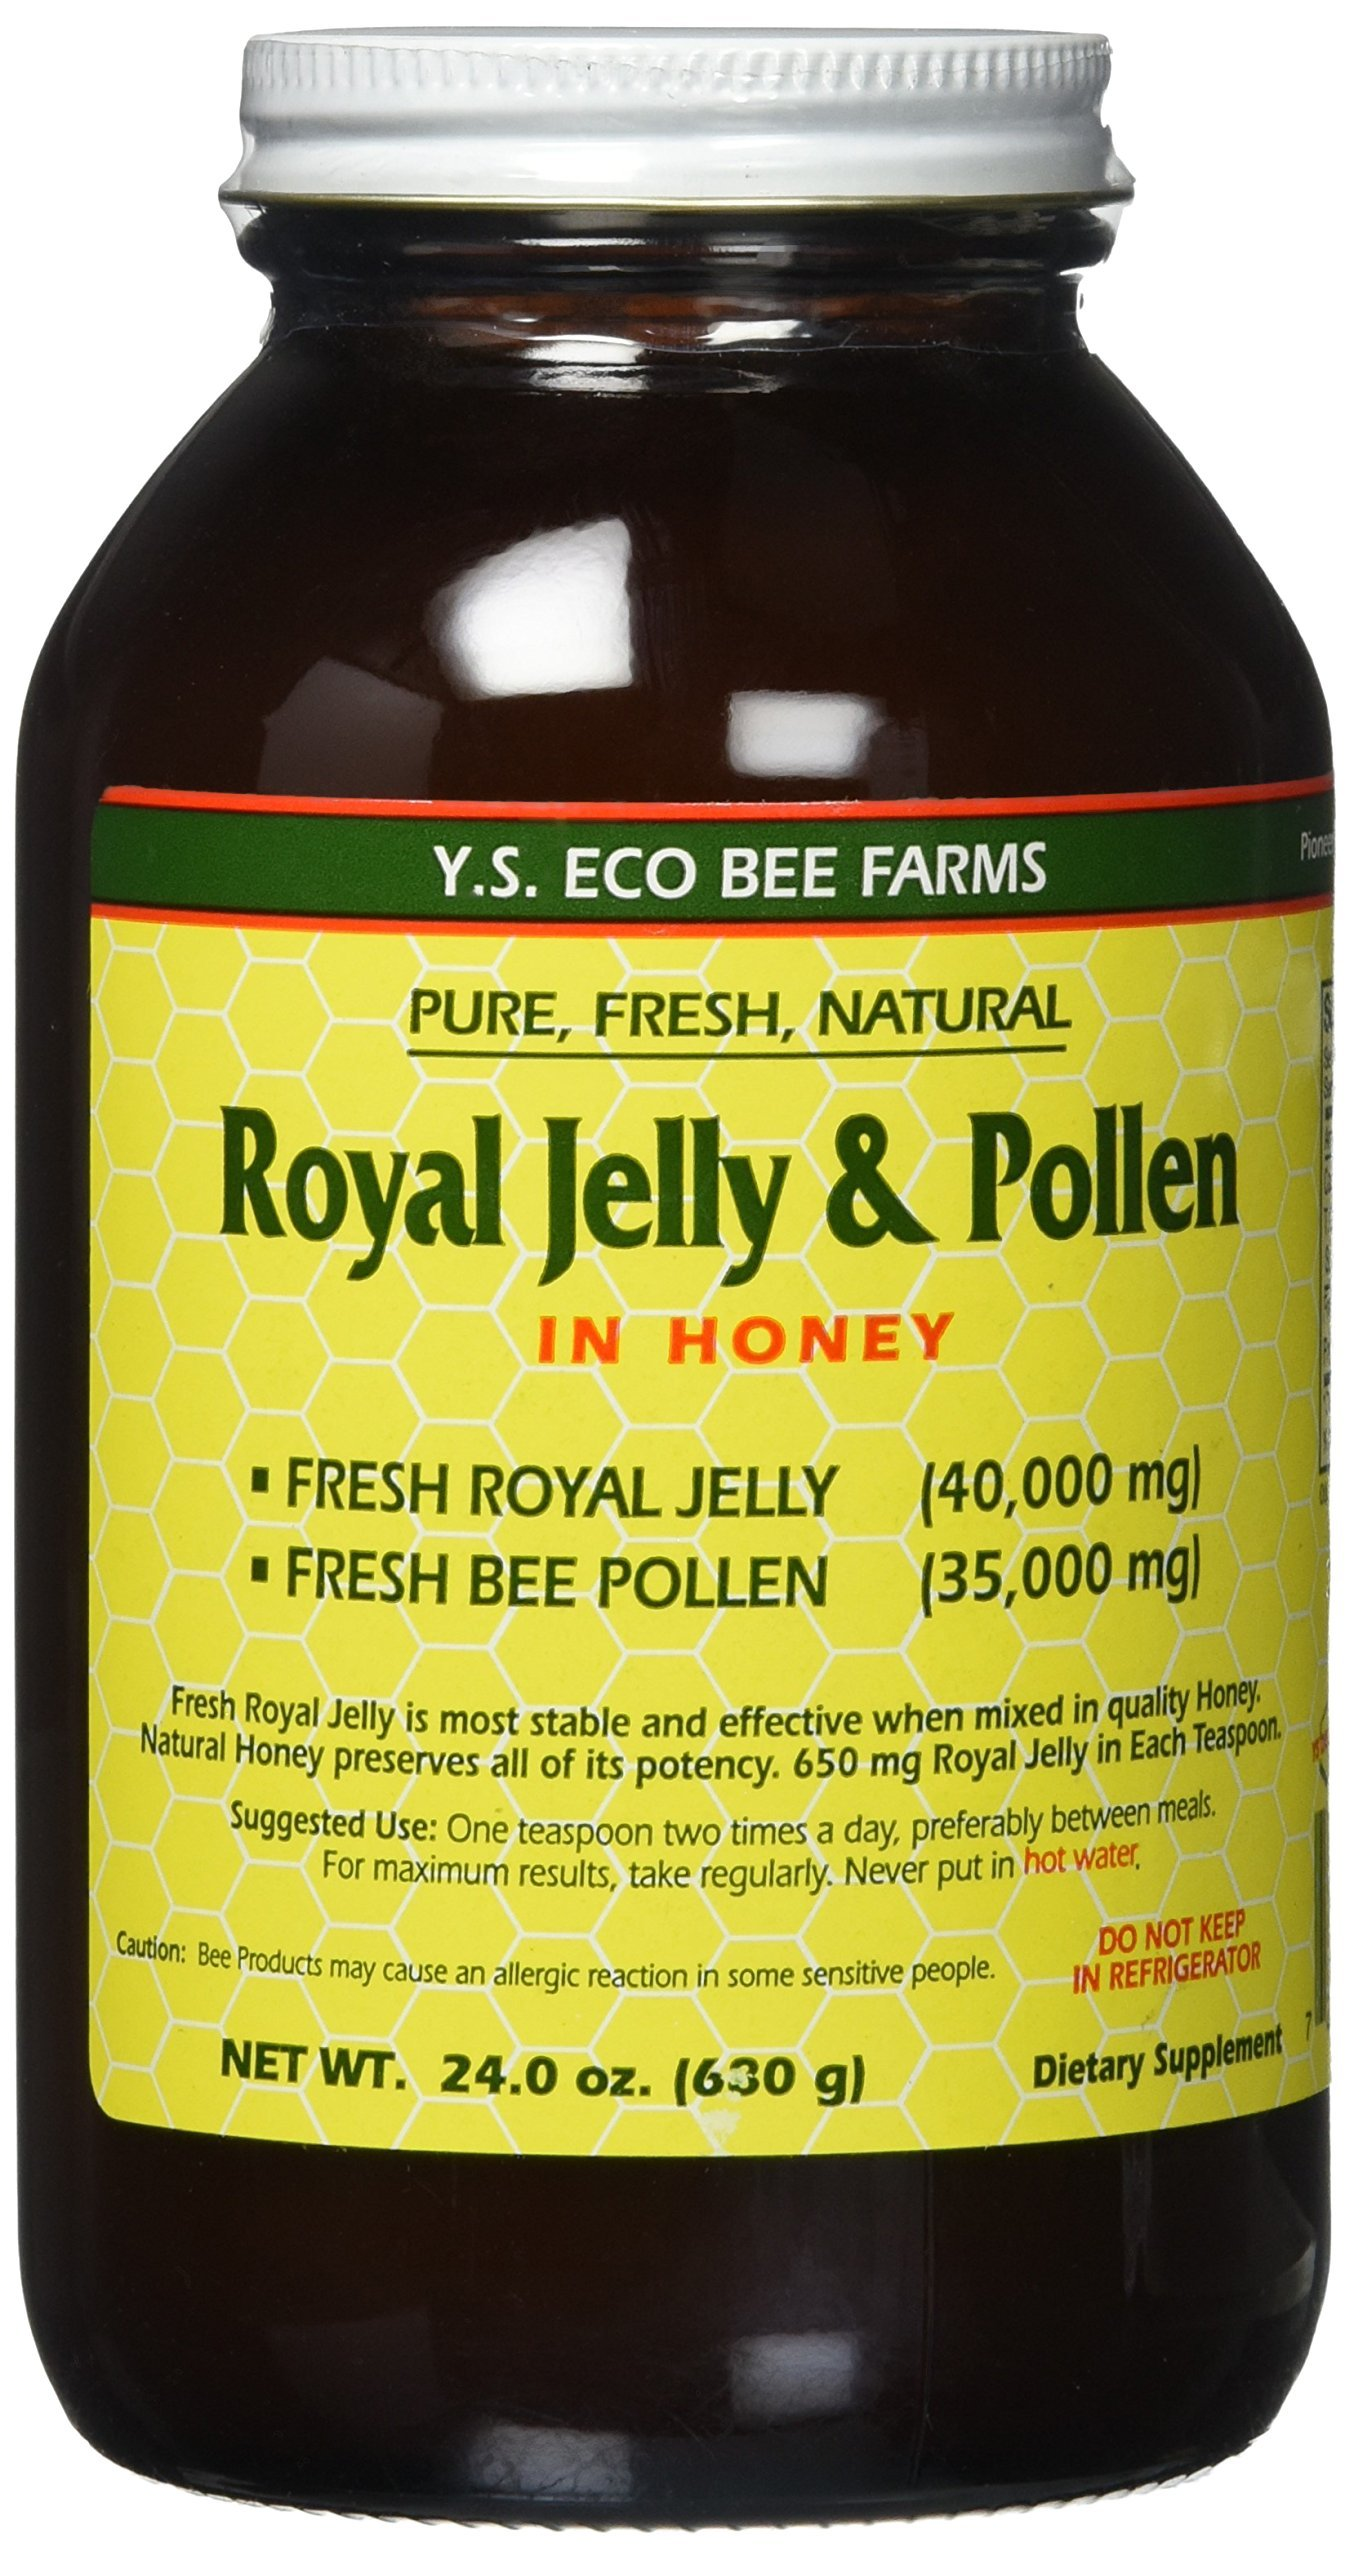 Fresh Royal Jelly + Bee Pollen, Honey Mix - 40,000 mg YS Eco Bee Farms 24.0 oz.